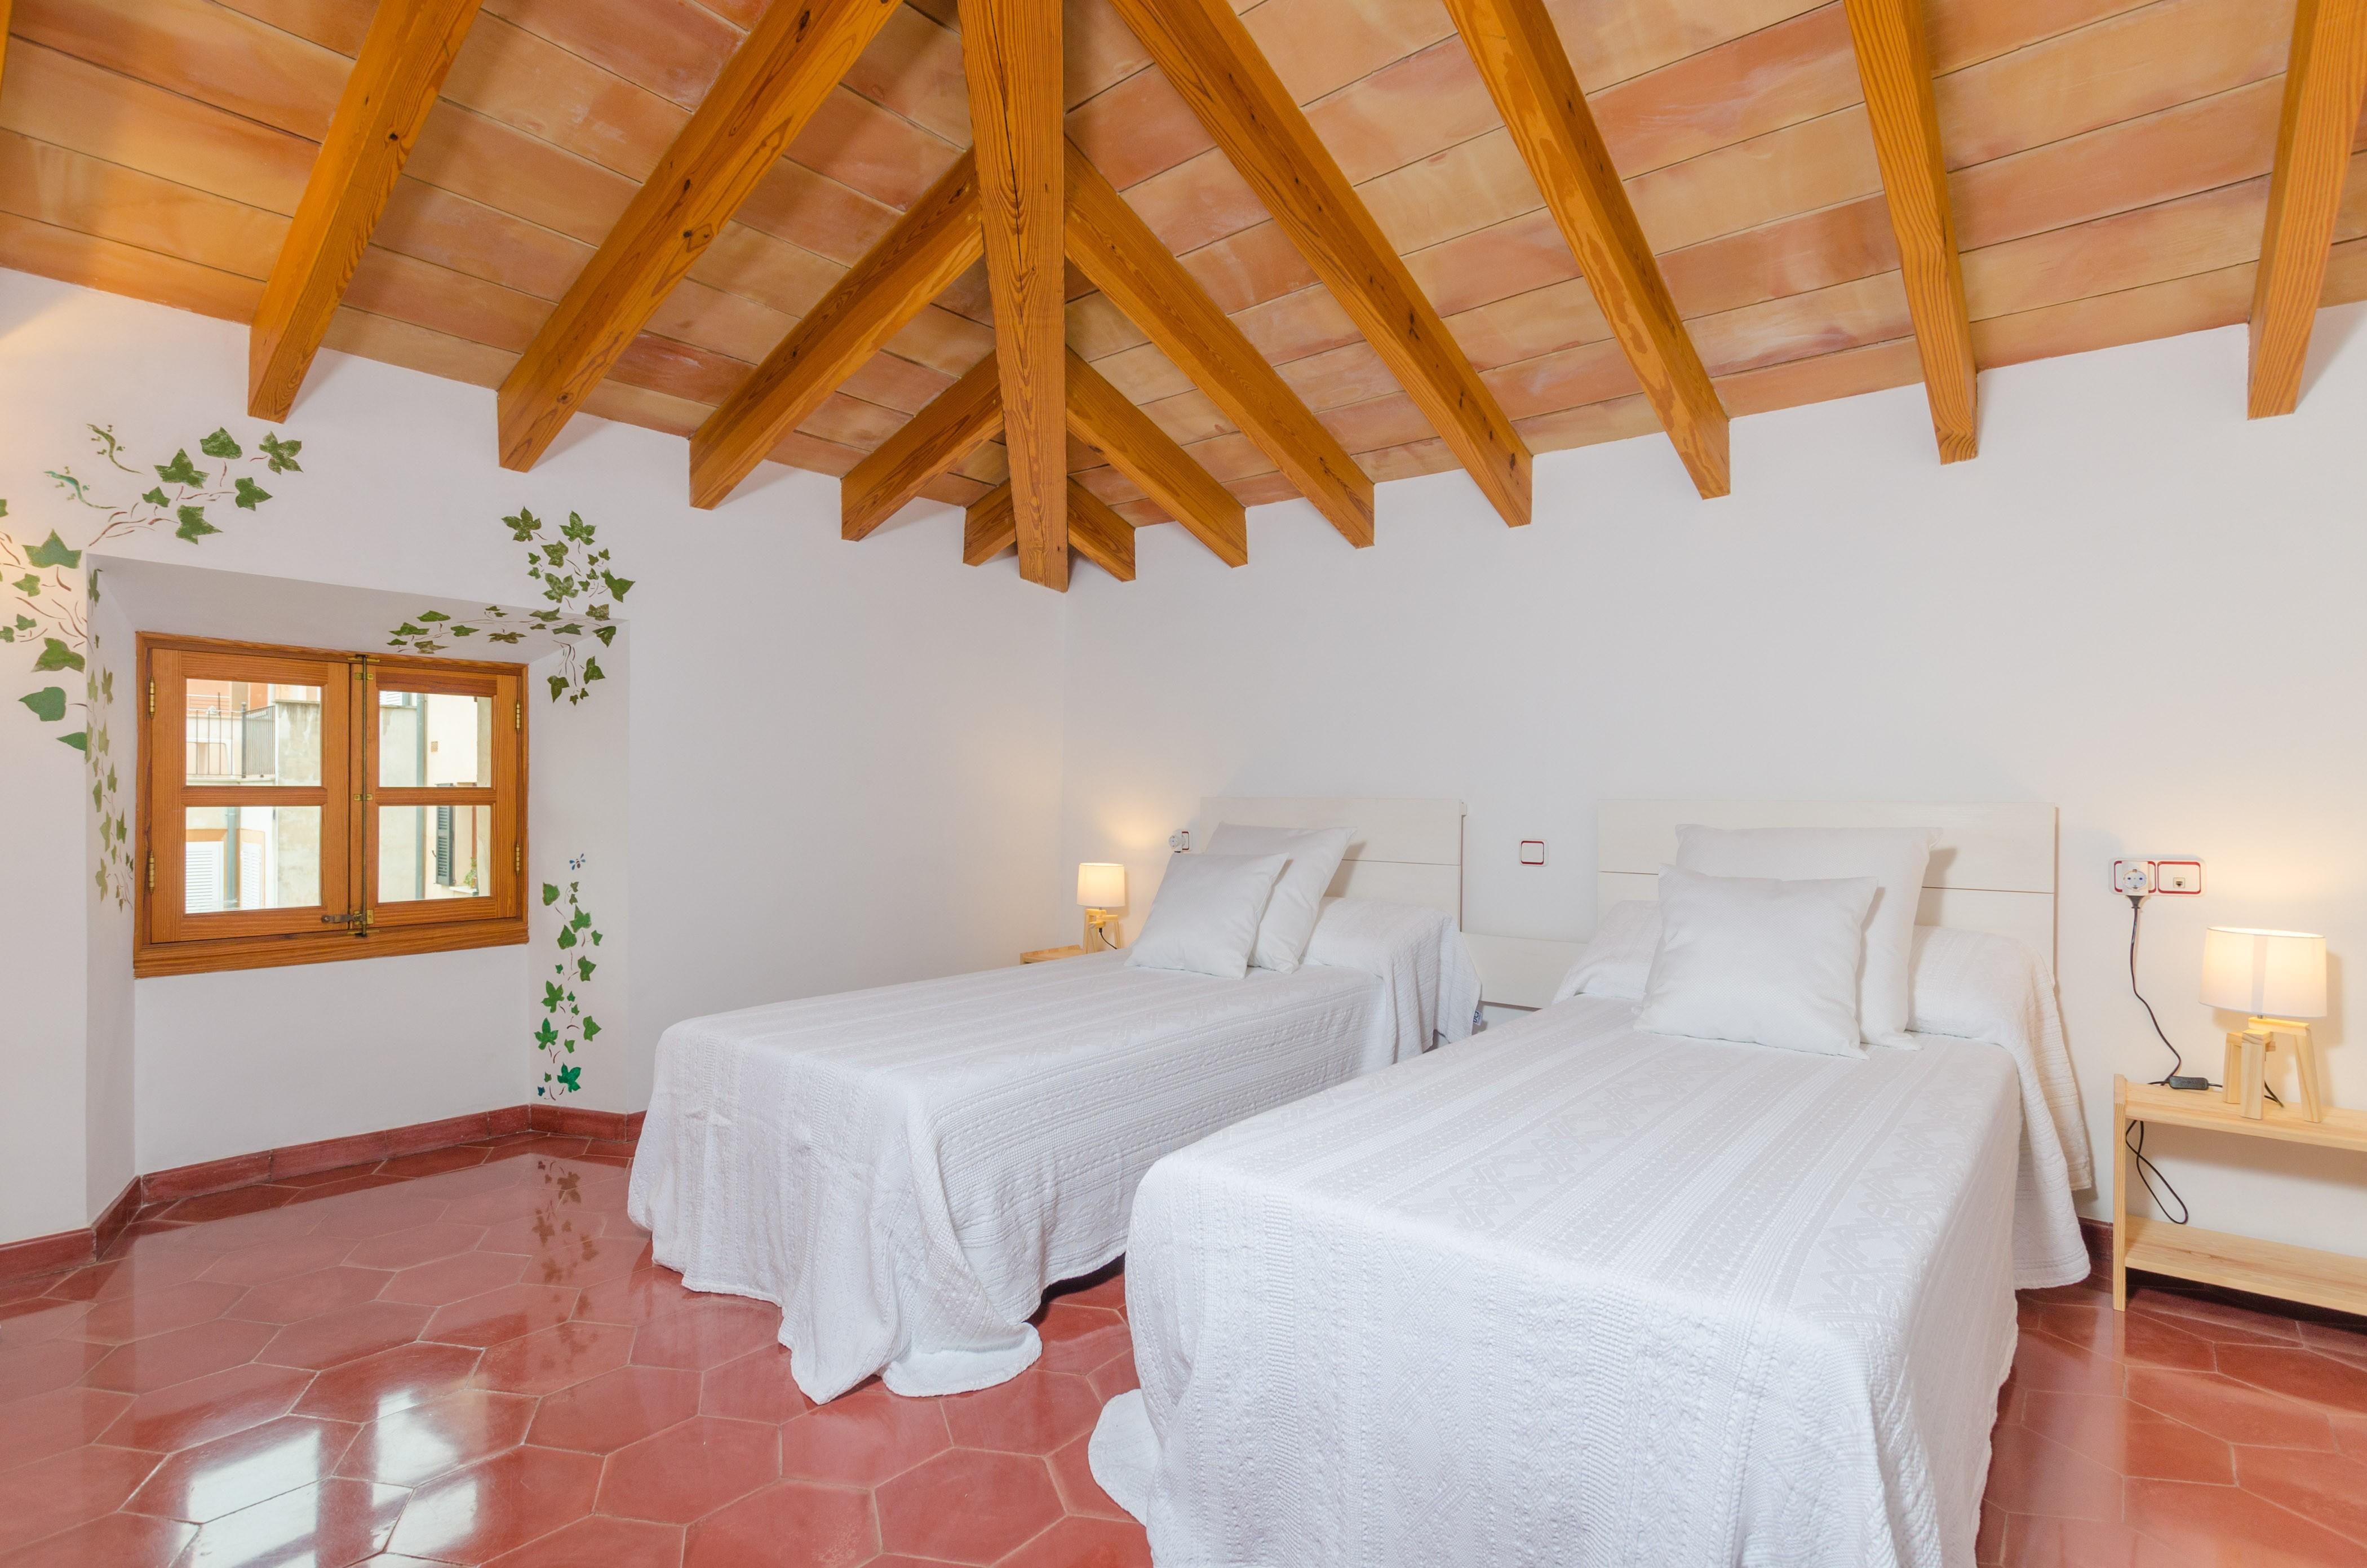 Maison de vacances CAS CONVIDATS (2435013), Alaro, Majorque, Iles Baléares, Espagne, image 49